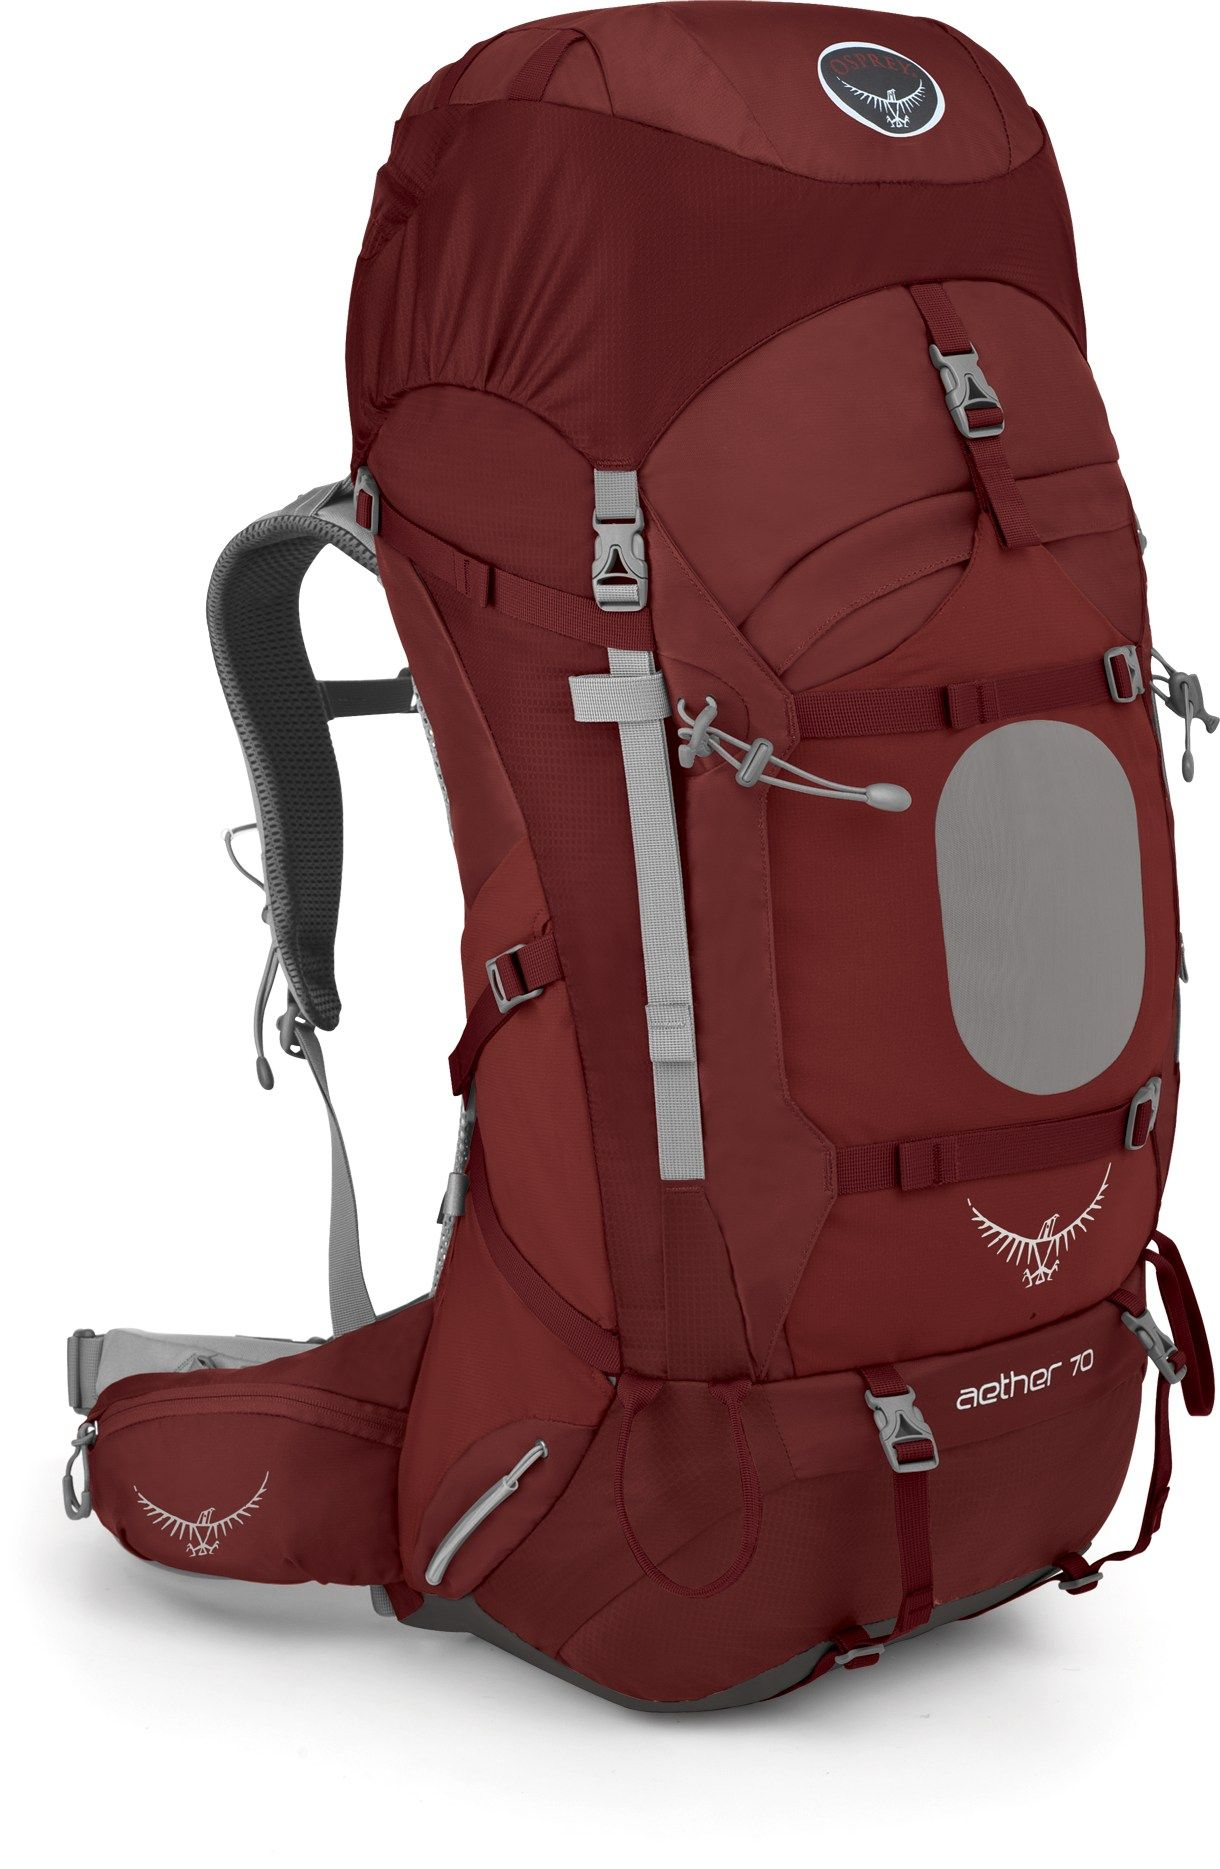 Osprey Backpacks, Backpacking Gear